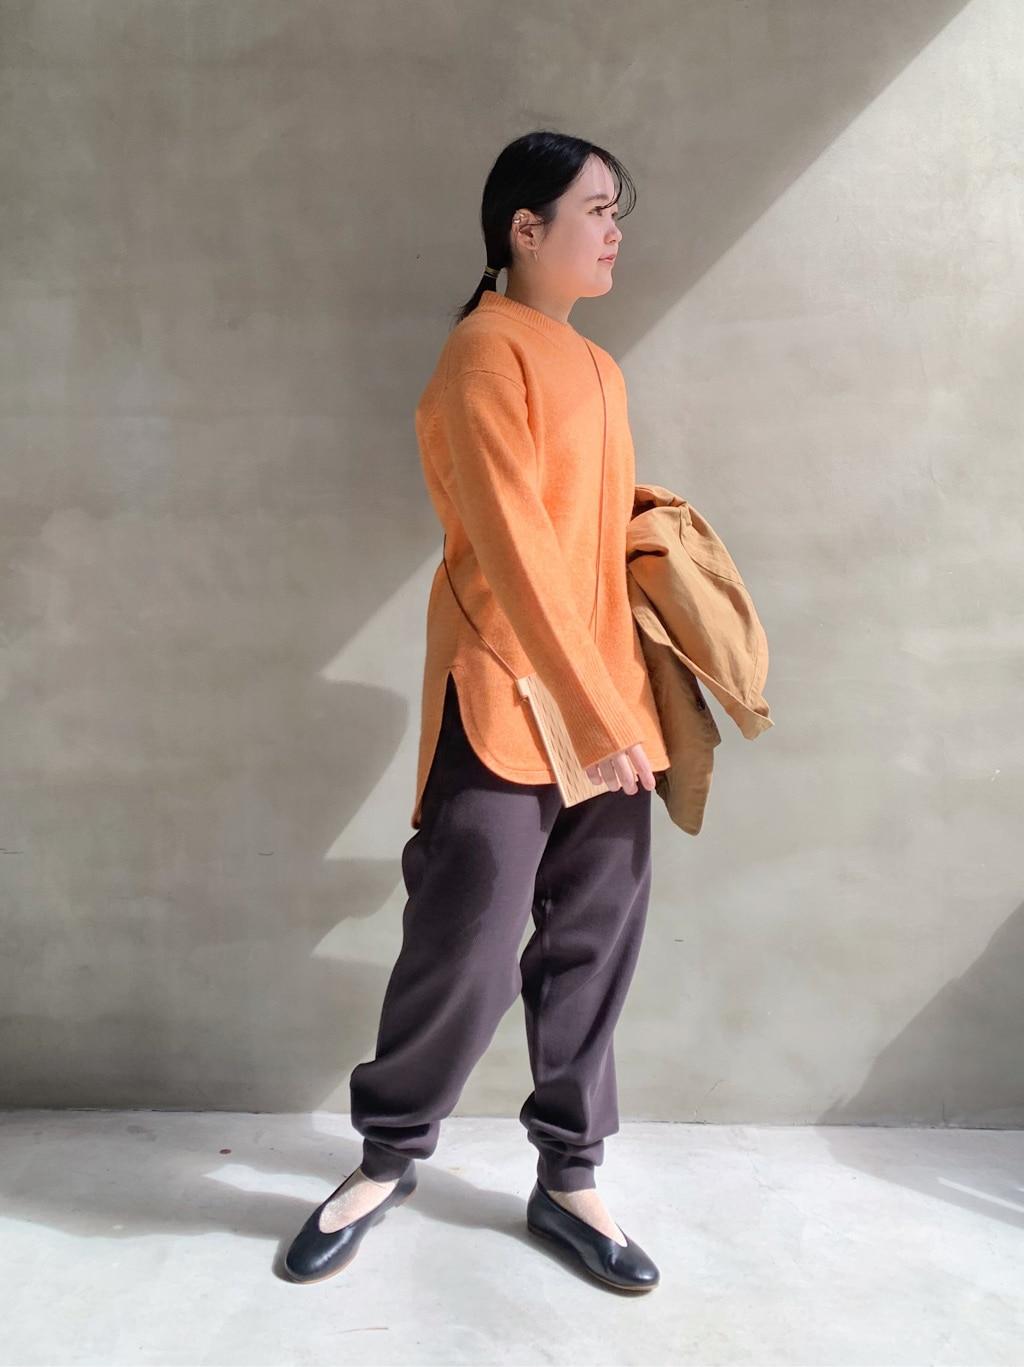 caph troupe 福岡薬院路面 身長:148cm 2020.10.30